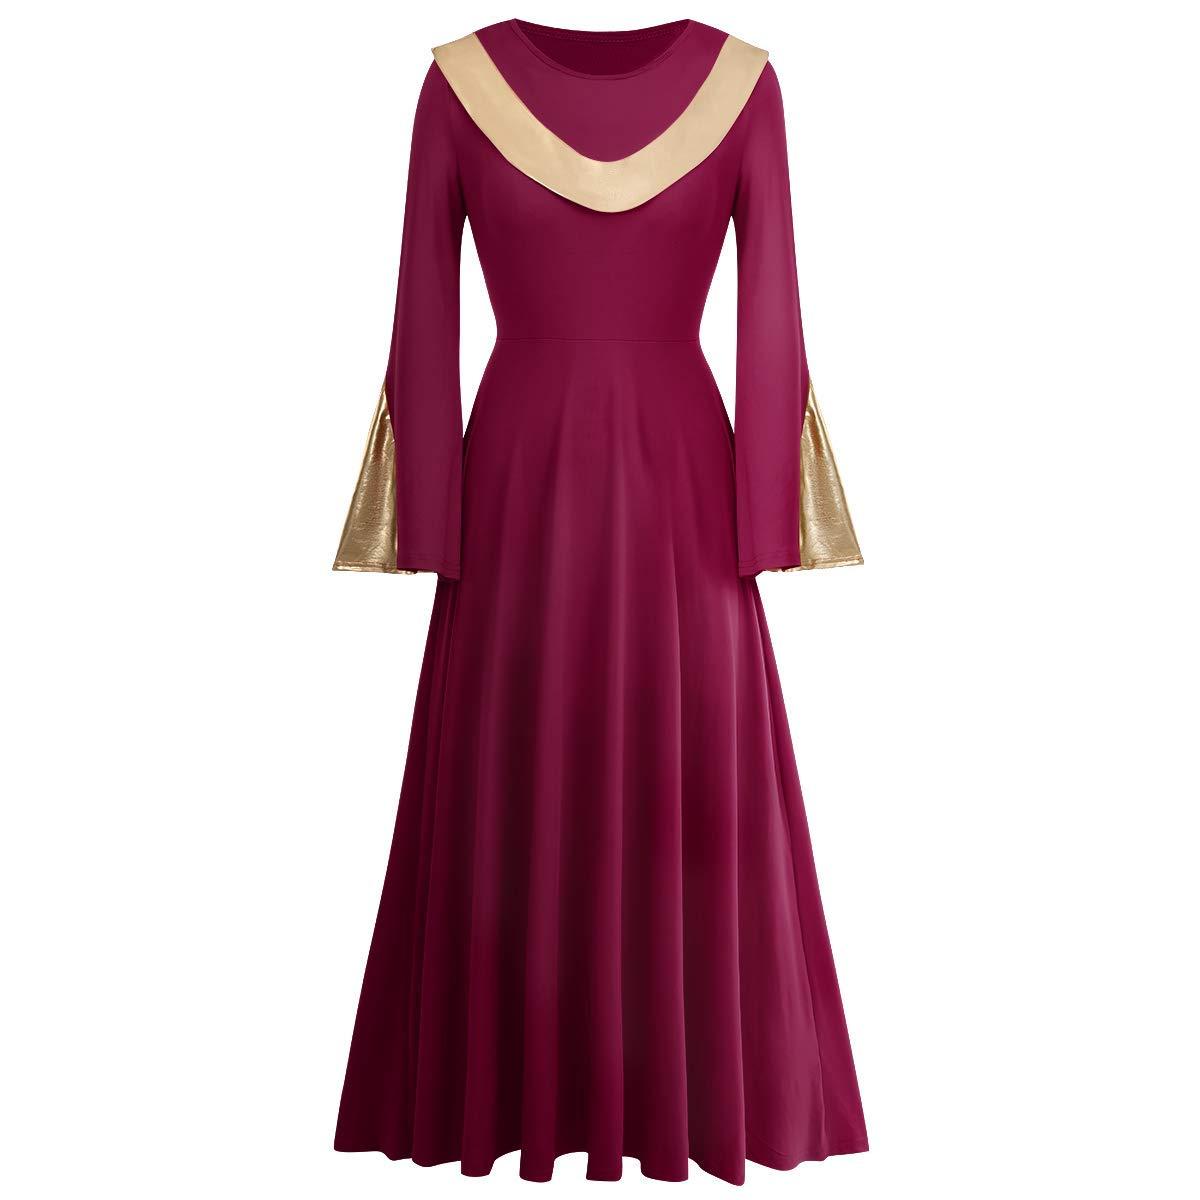 IBAKOM Women Metallic Gold Liturgical Praise Dance Worship Dress Long Sleeve Loose Fit Full Length Dancewear Tunic Costume